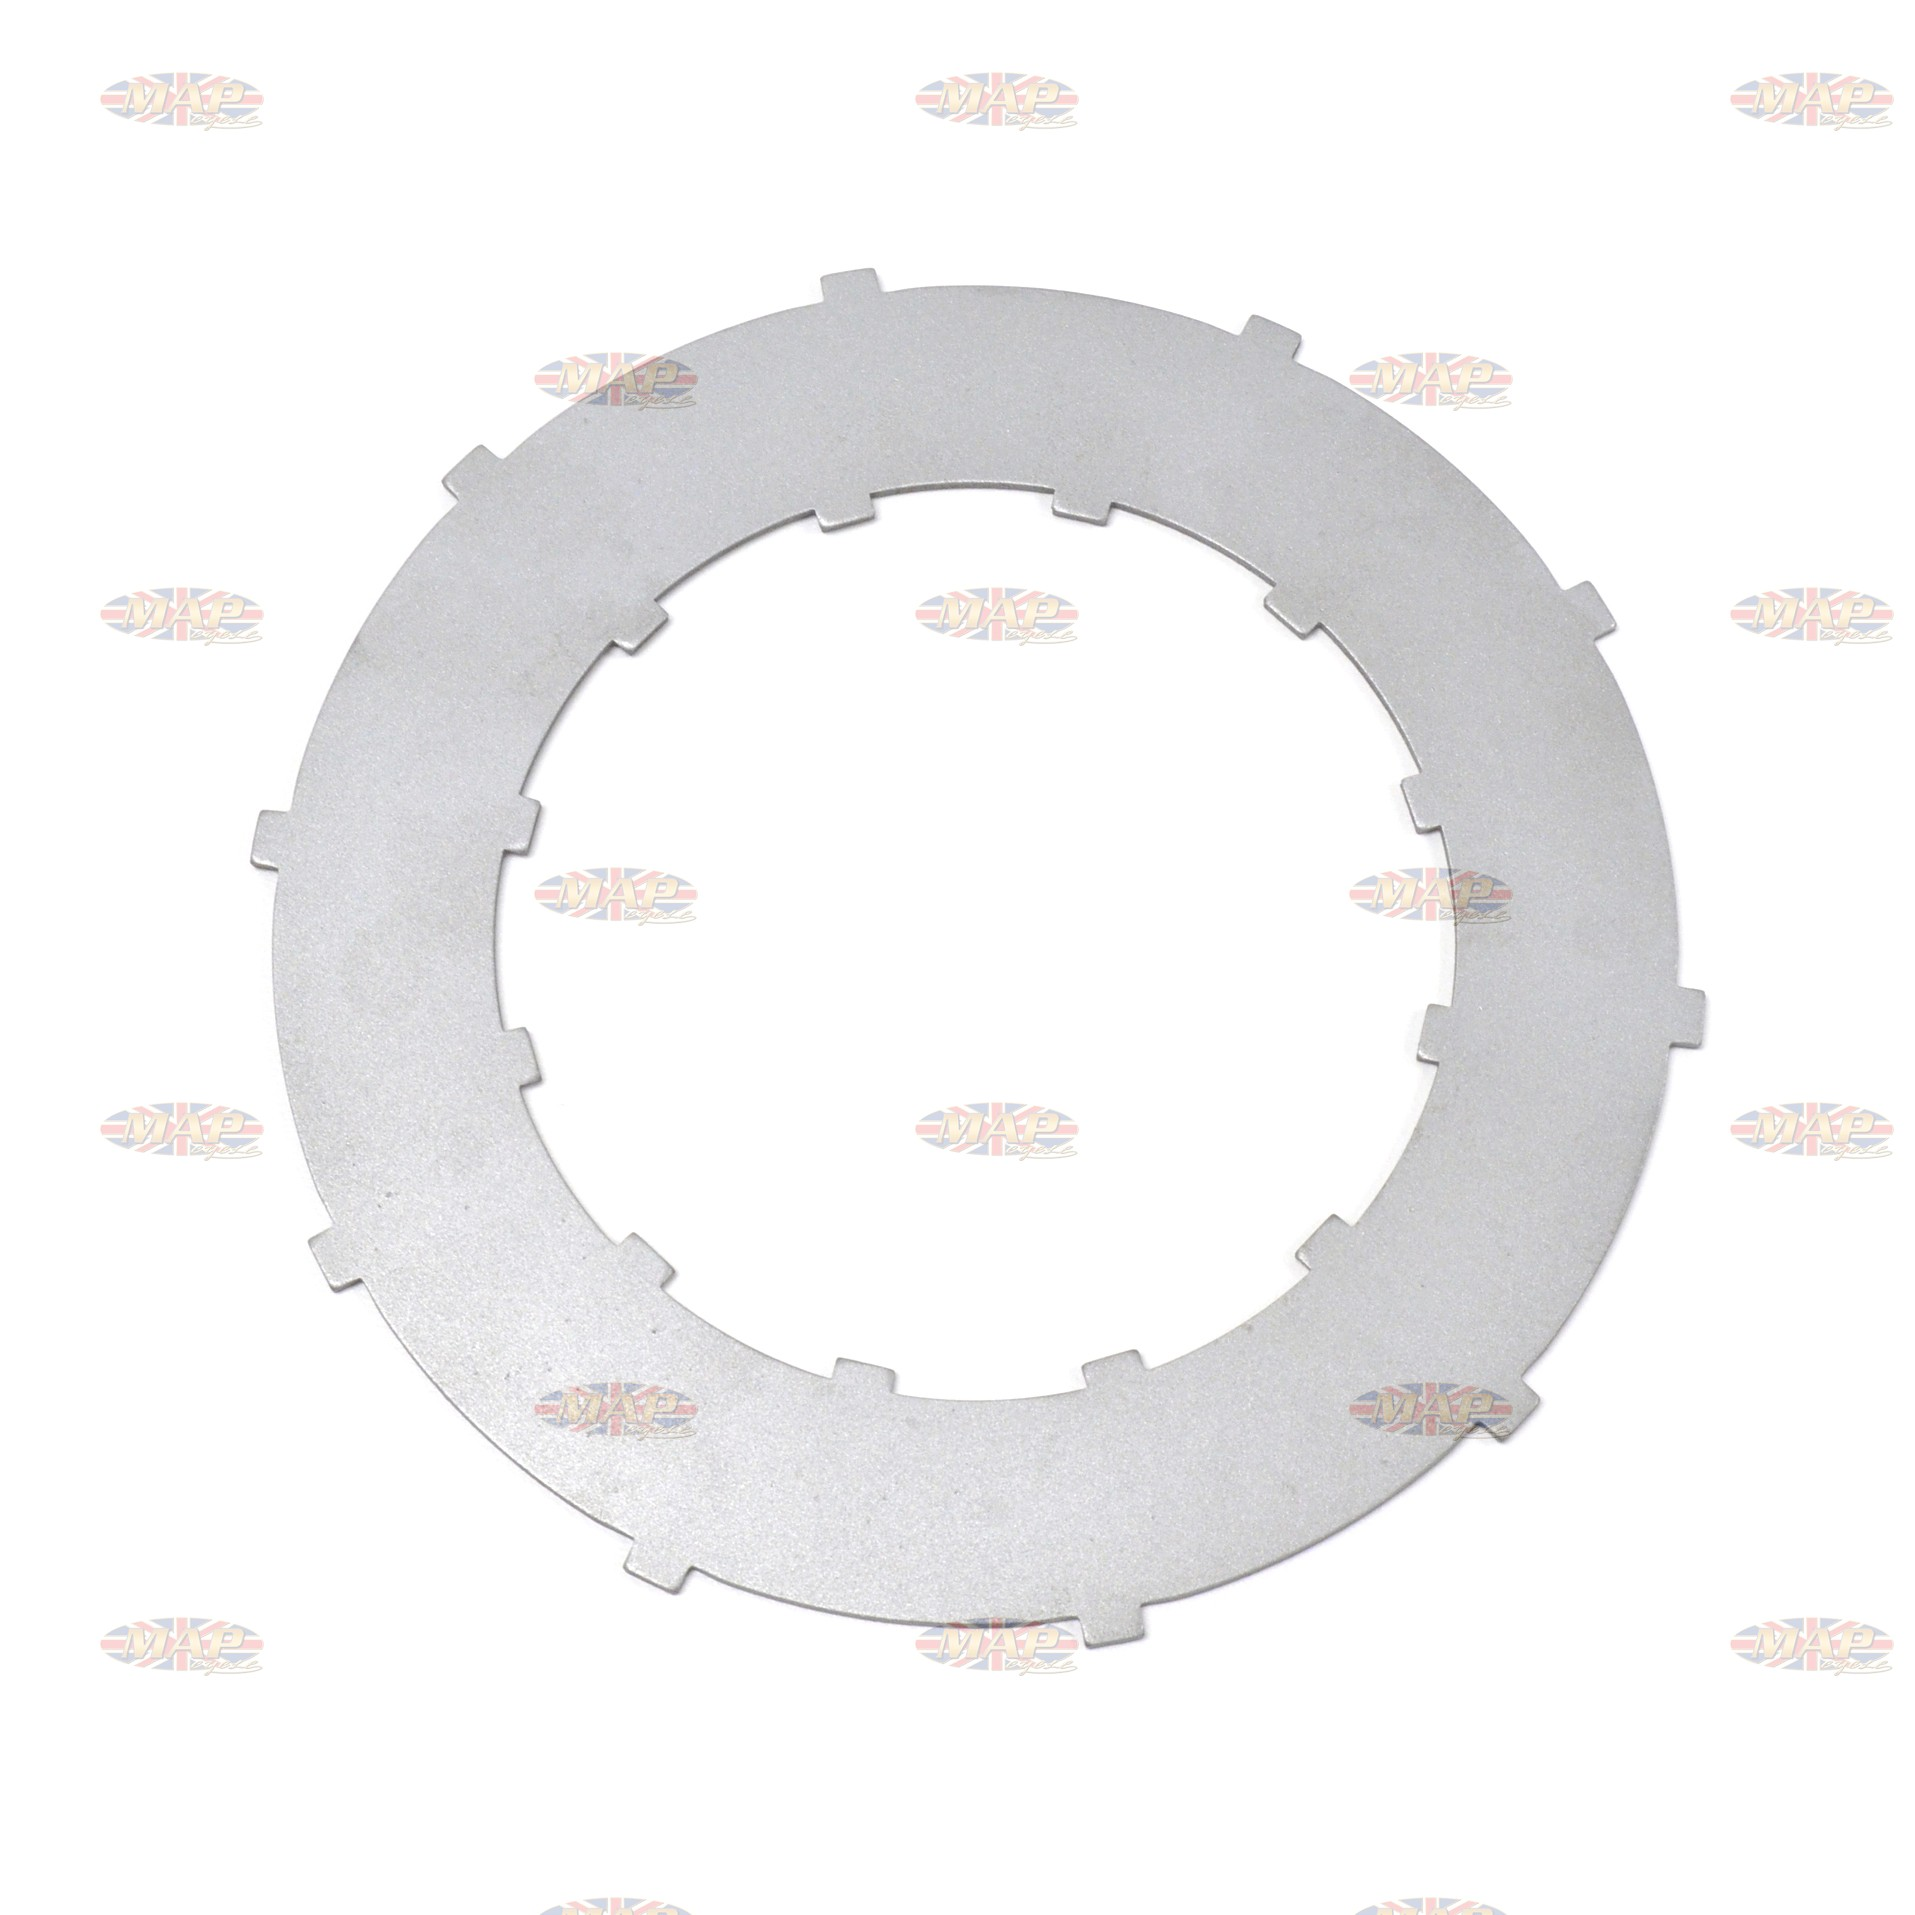 Triumph BSA Clutch Locking Tool MAP0879